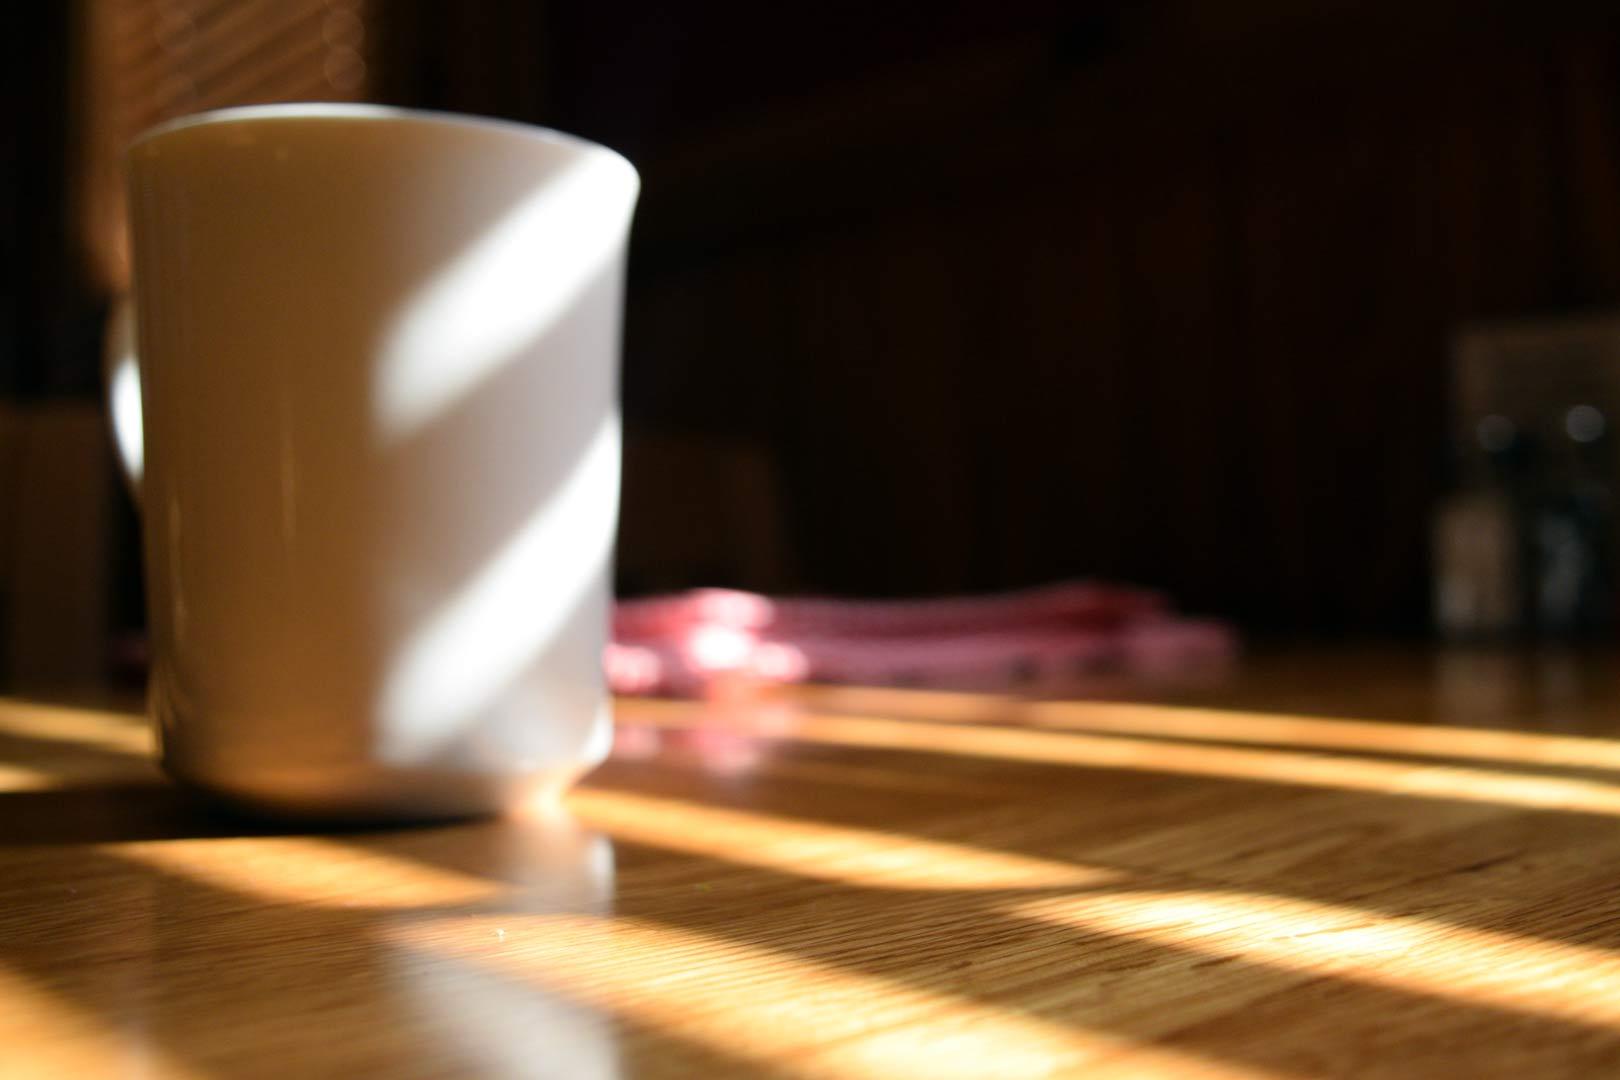 barn-coffee.jpg